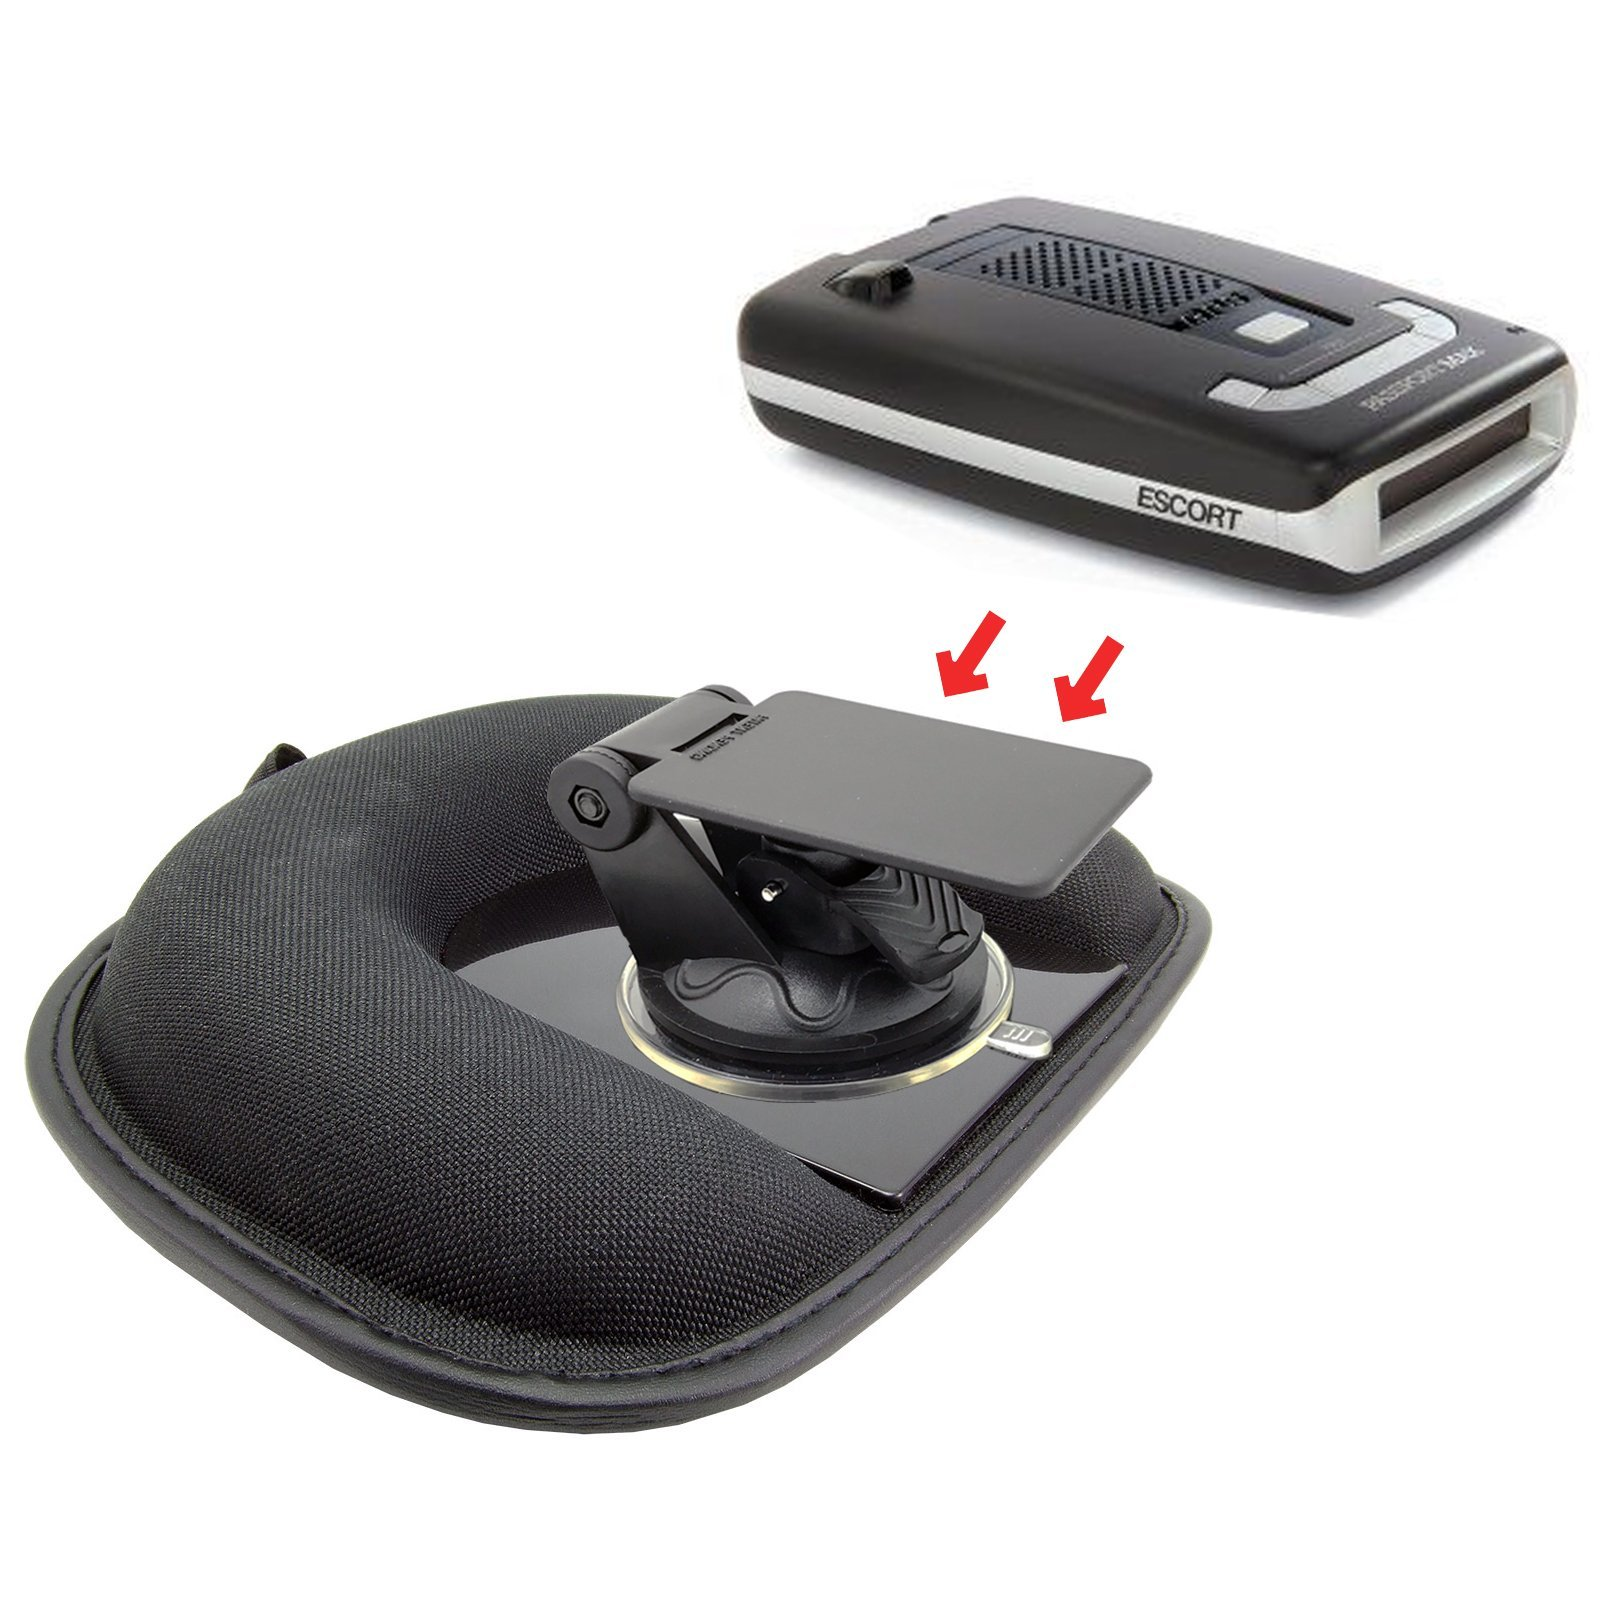 AccessoryBasics Car Dashboard Platform Beanbag & Suction Cup Mount for Radar Detector Escort Passport 8500x50 9500 Max S55 X80 Redline EX iX S3 S4 Beltronics Uniden R3 Whistler Cobra ESD XRS SPX by ChargerCity (Image #3)